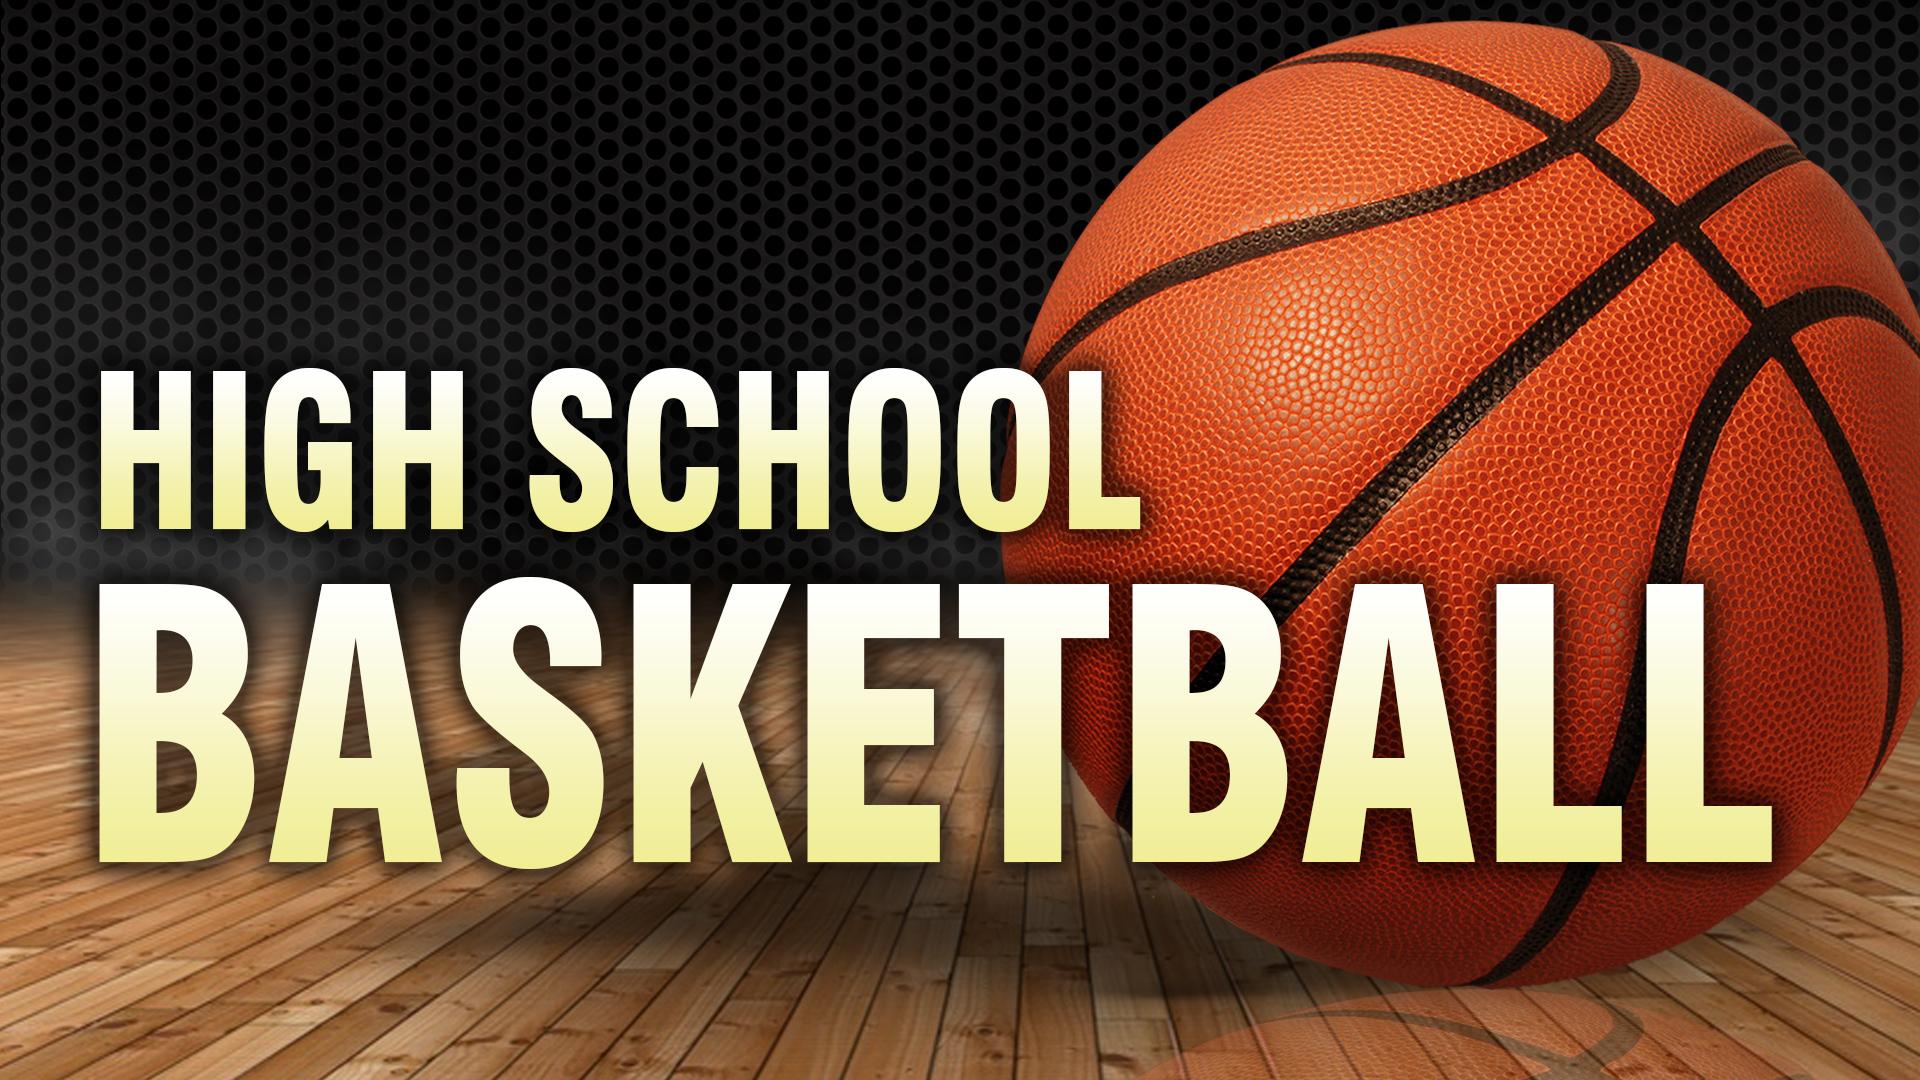 High School Basketball_1542754708188.jpg.jpg